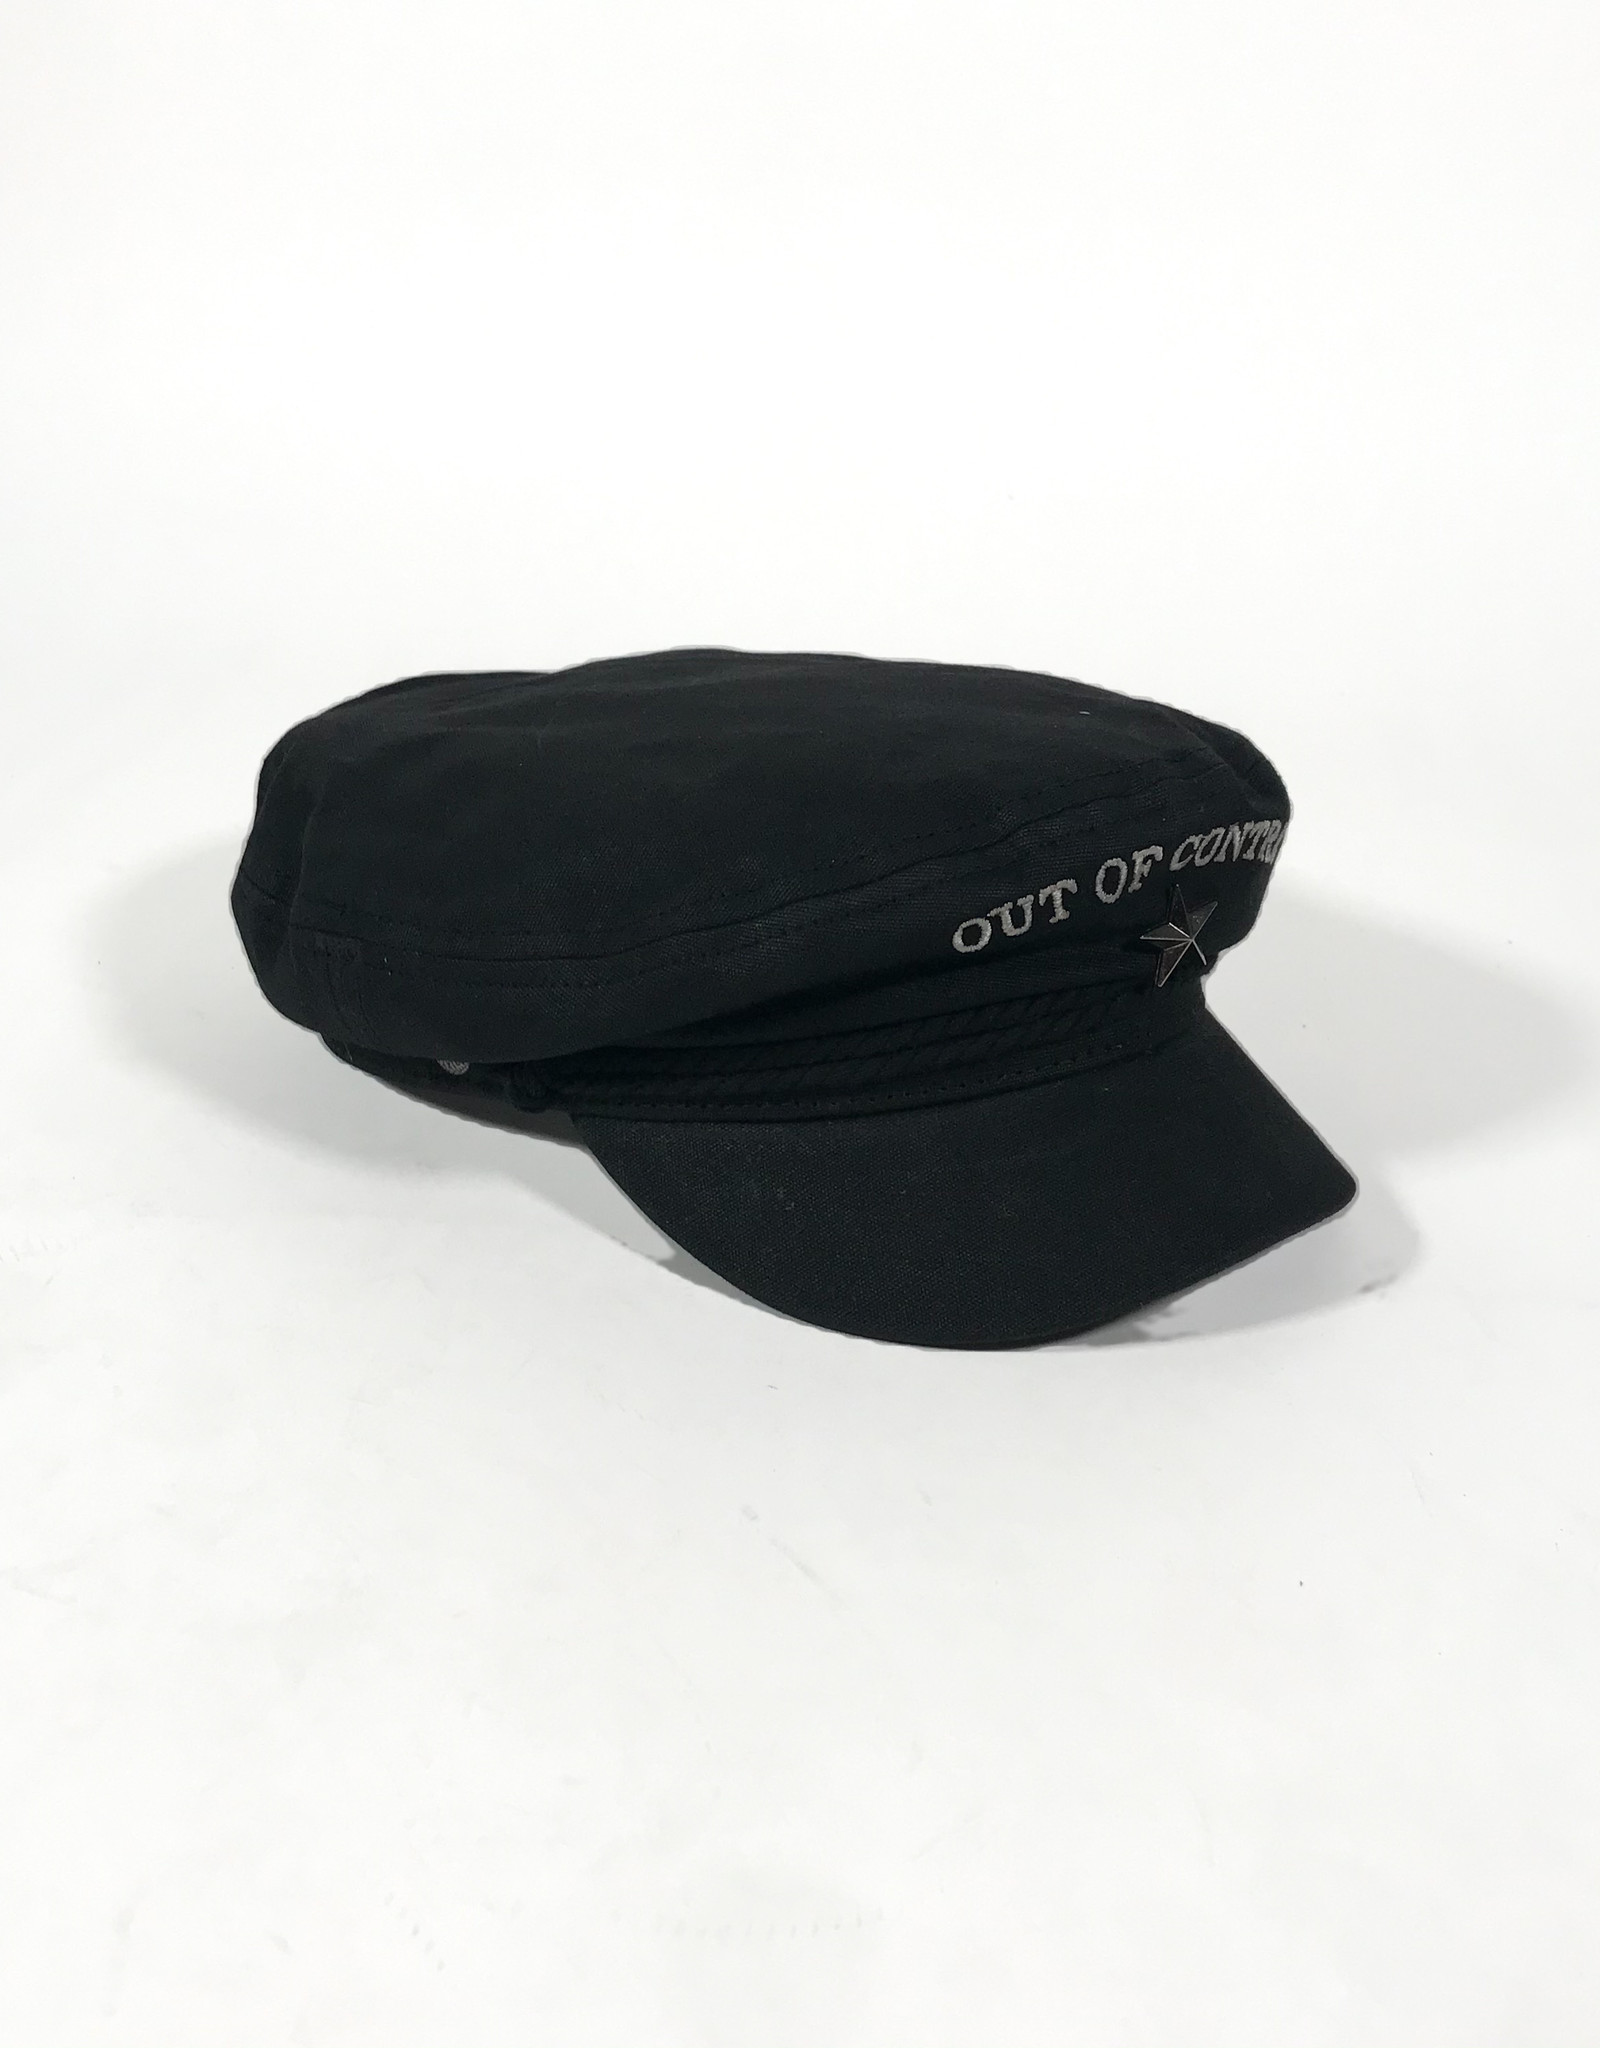 BRIXTON BRIXTON STRUMMER FIDDLER CAP MEDIUM - BLACK